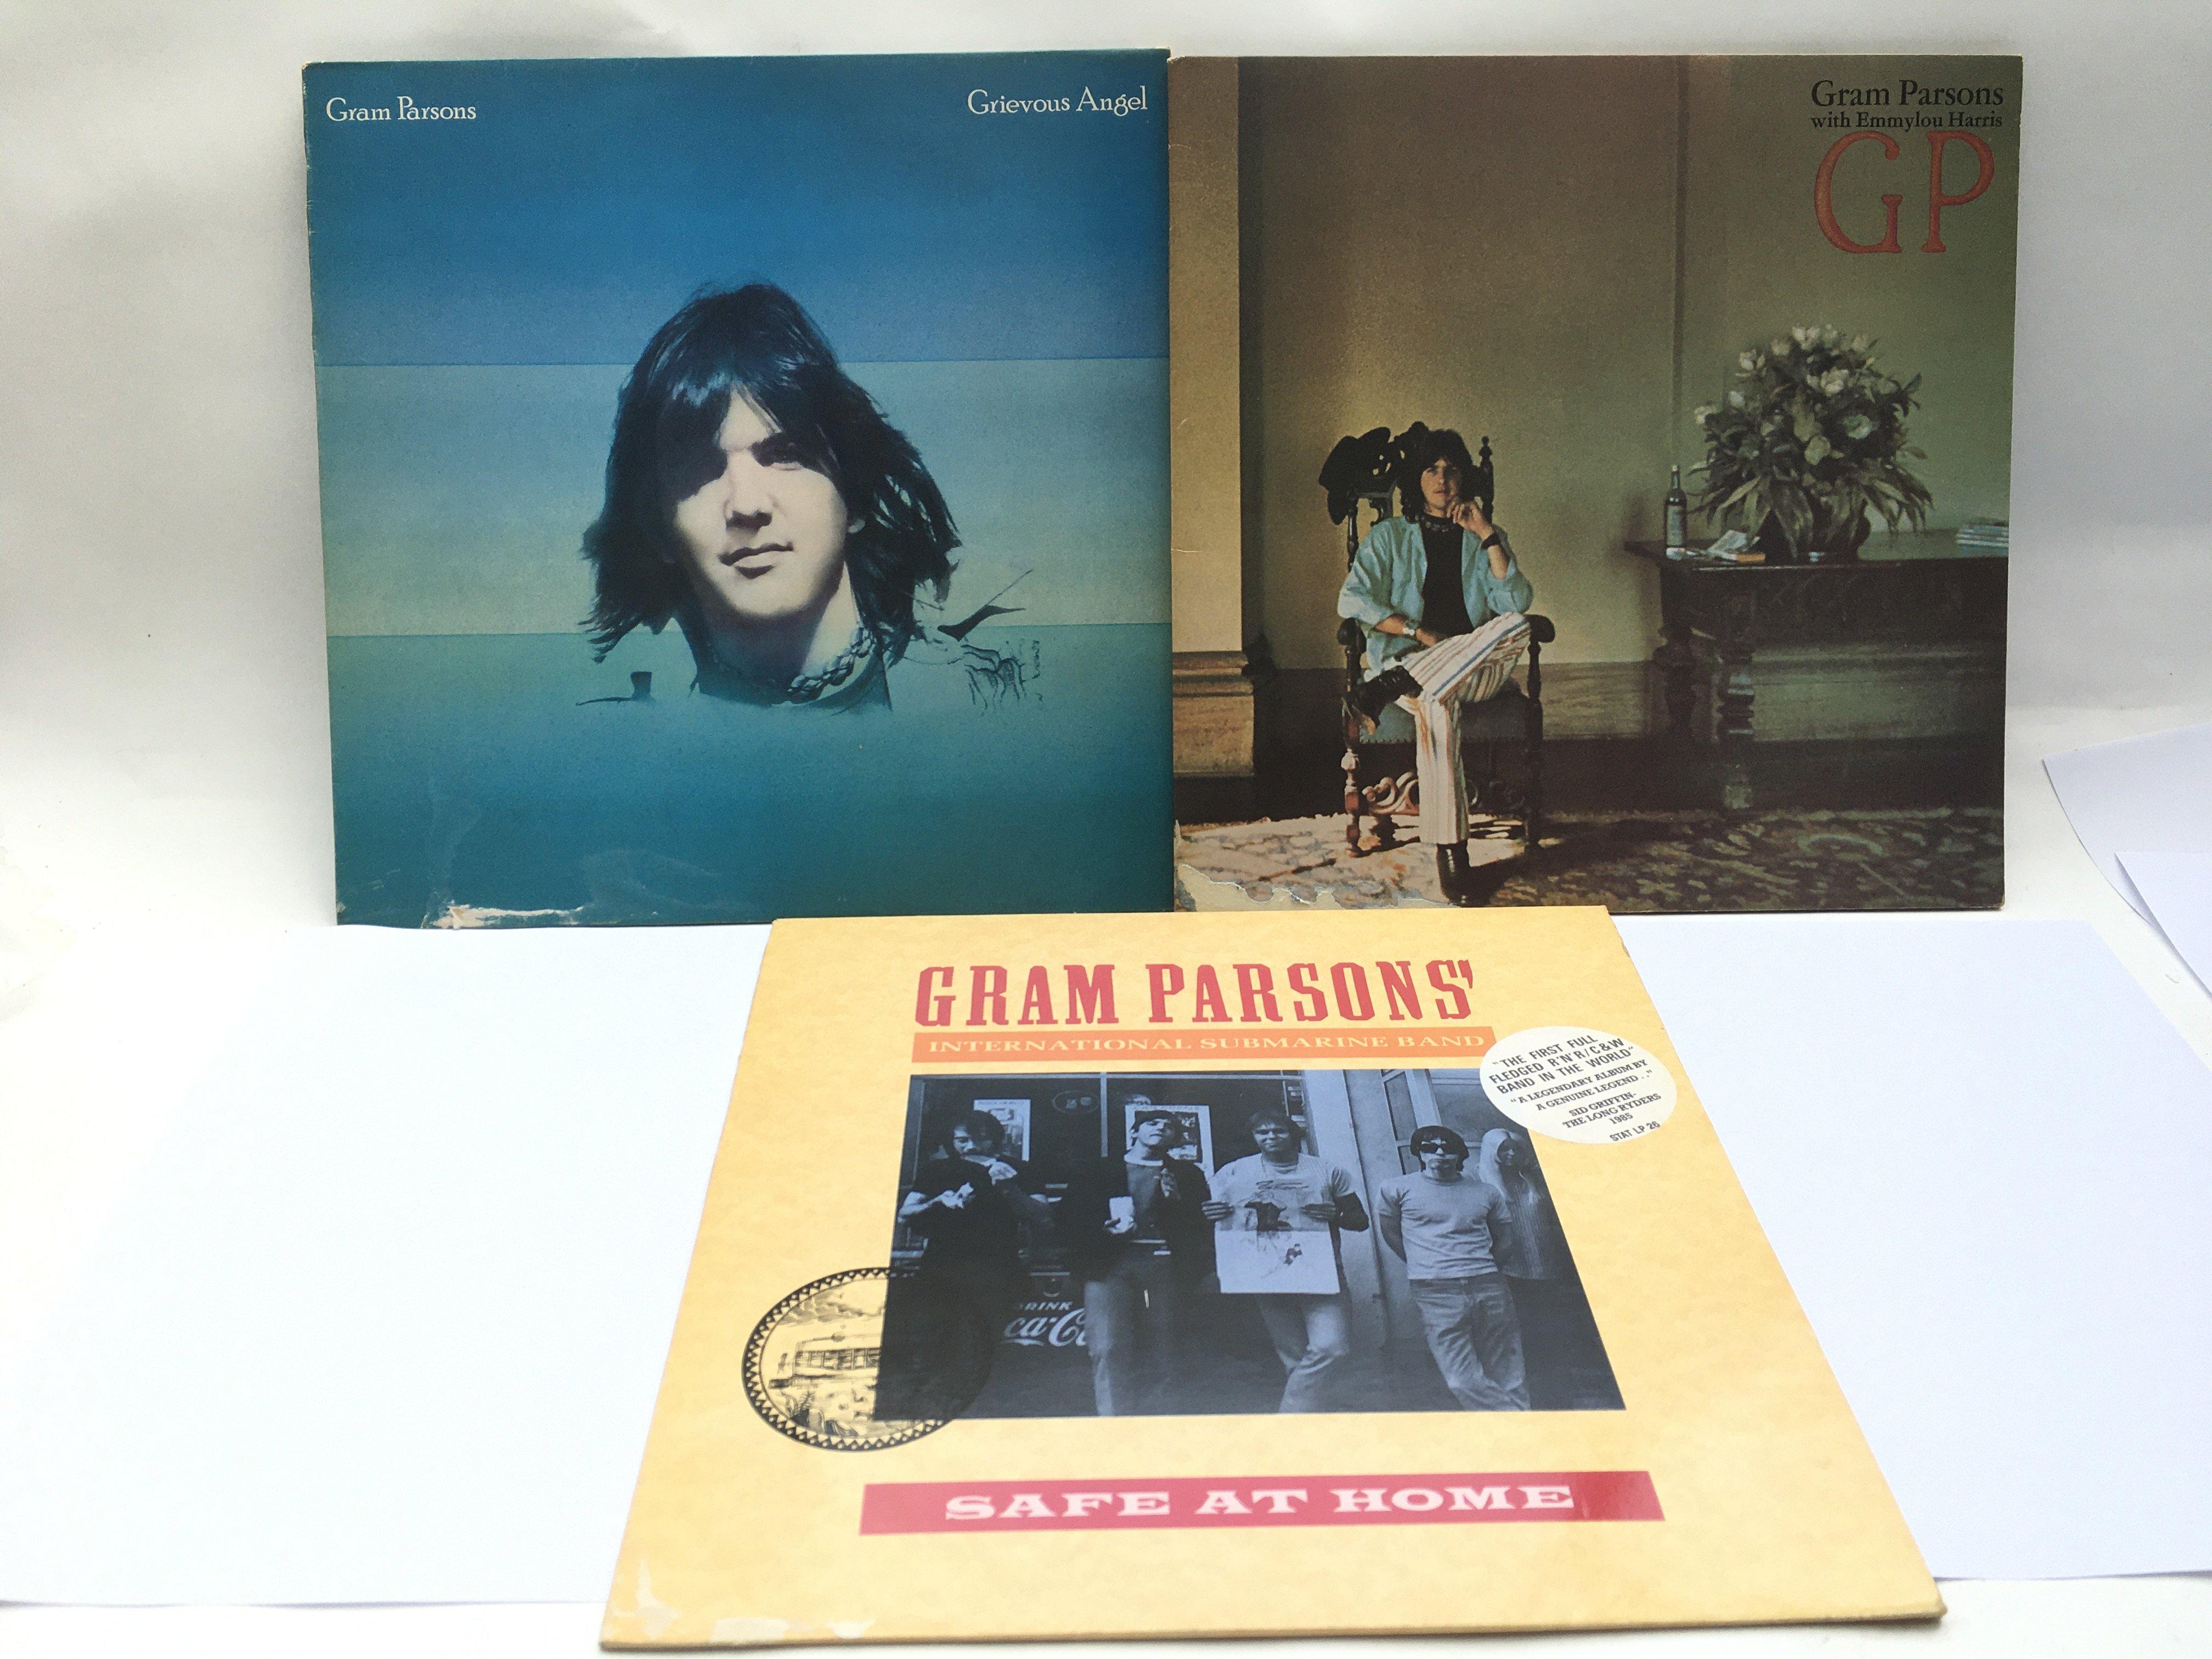 Three Gram Parsons LPs comprising 'Grievous Angel'